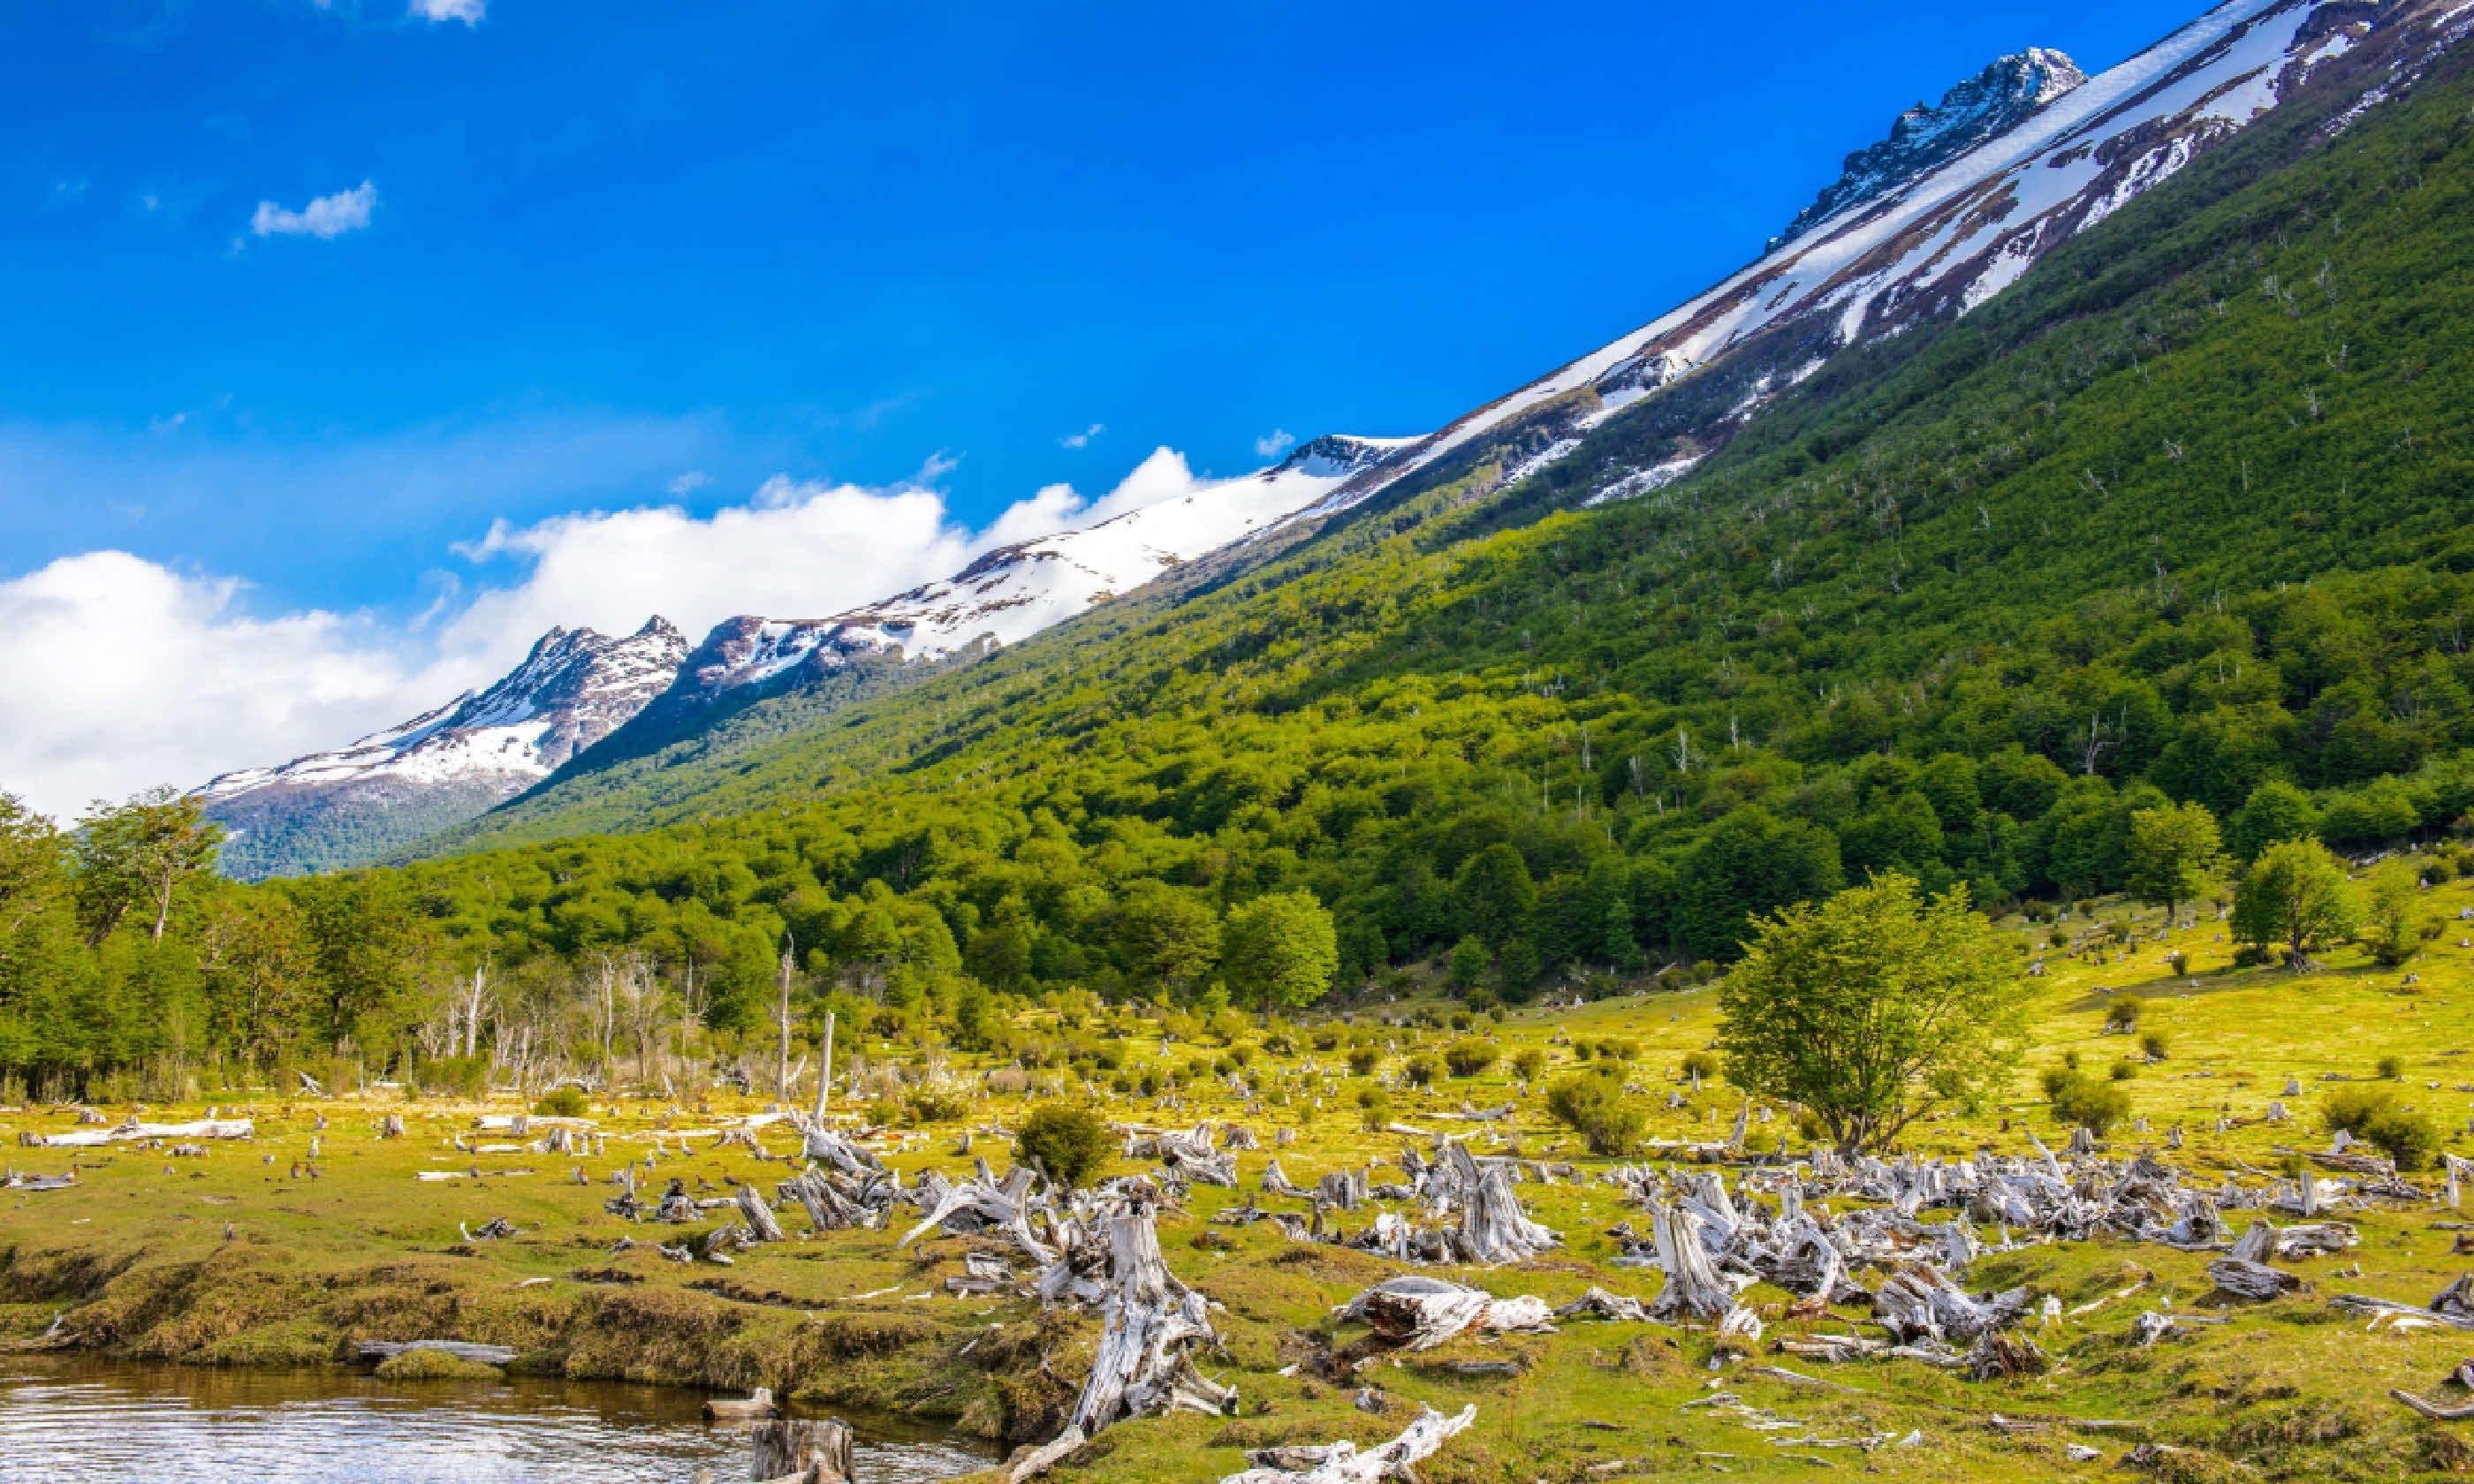 Landscape of Tierra del Fuego National Park (Shutterstock)